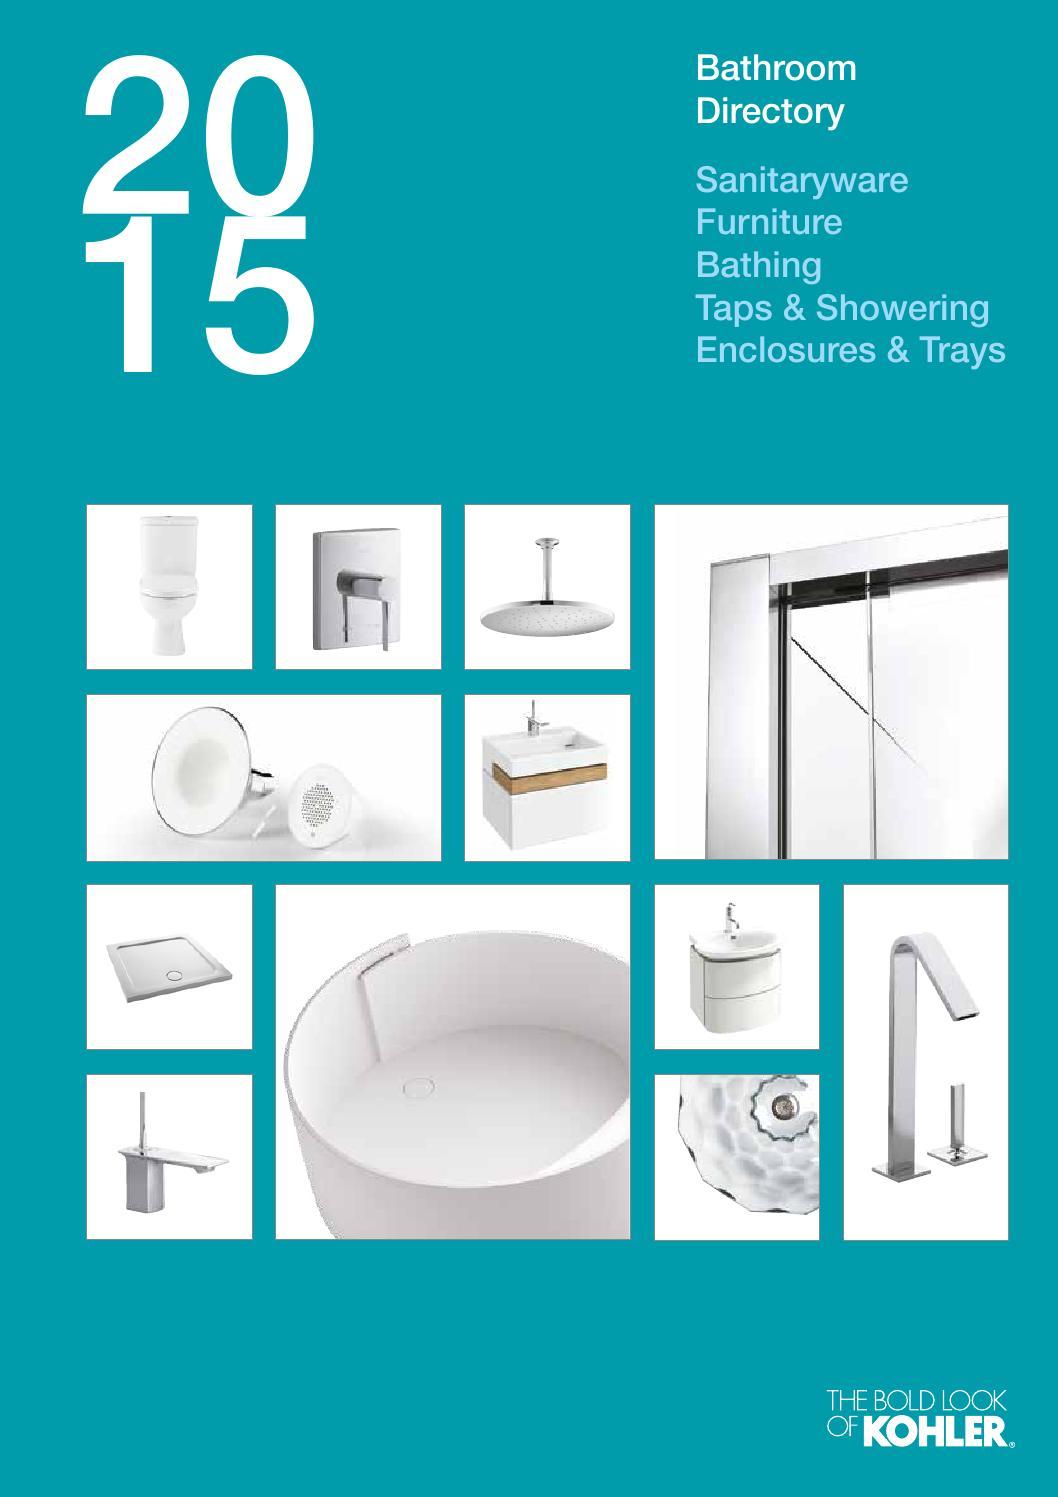 Cool Kohler Sanitaryware Photos Bathroom And Shower Ideas